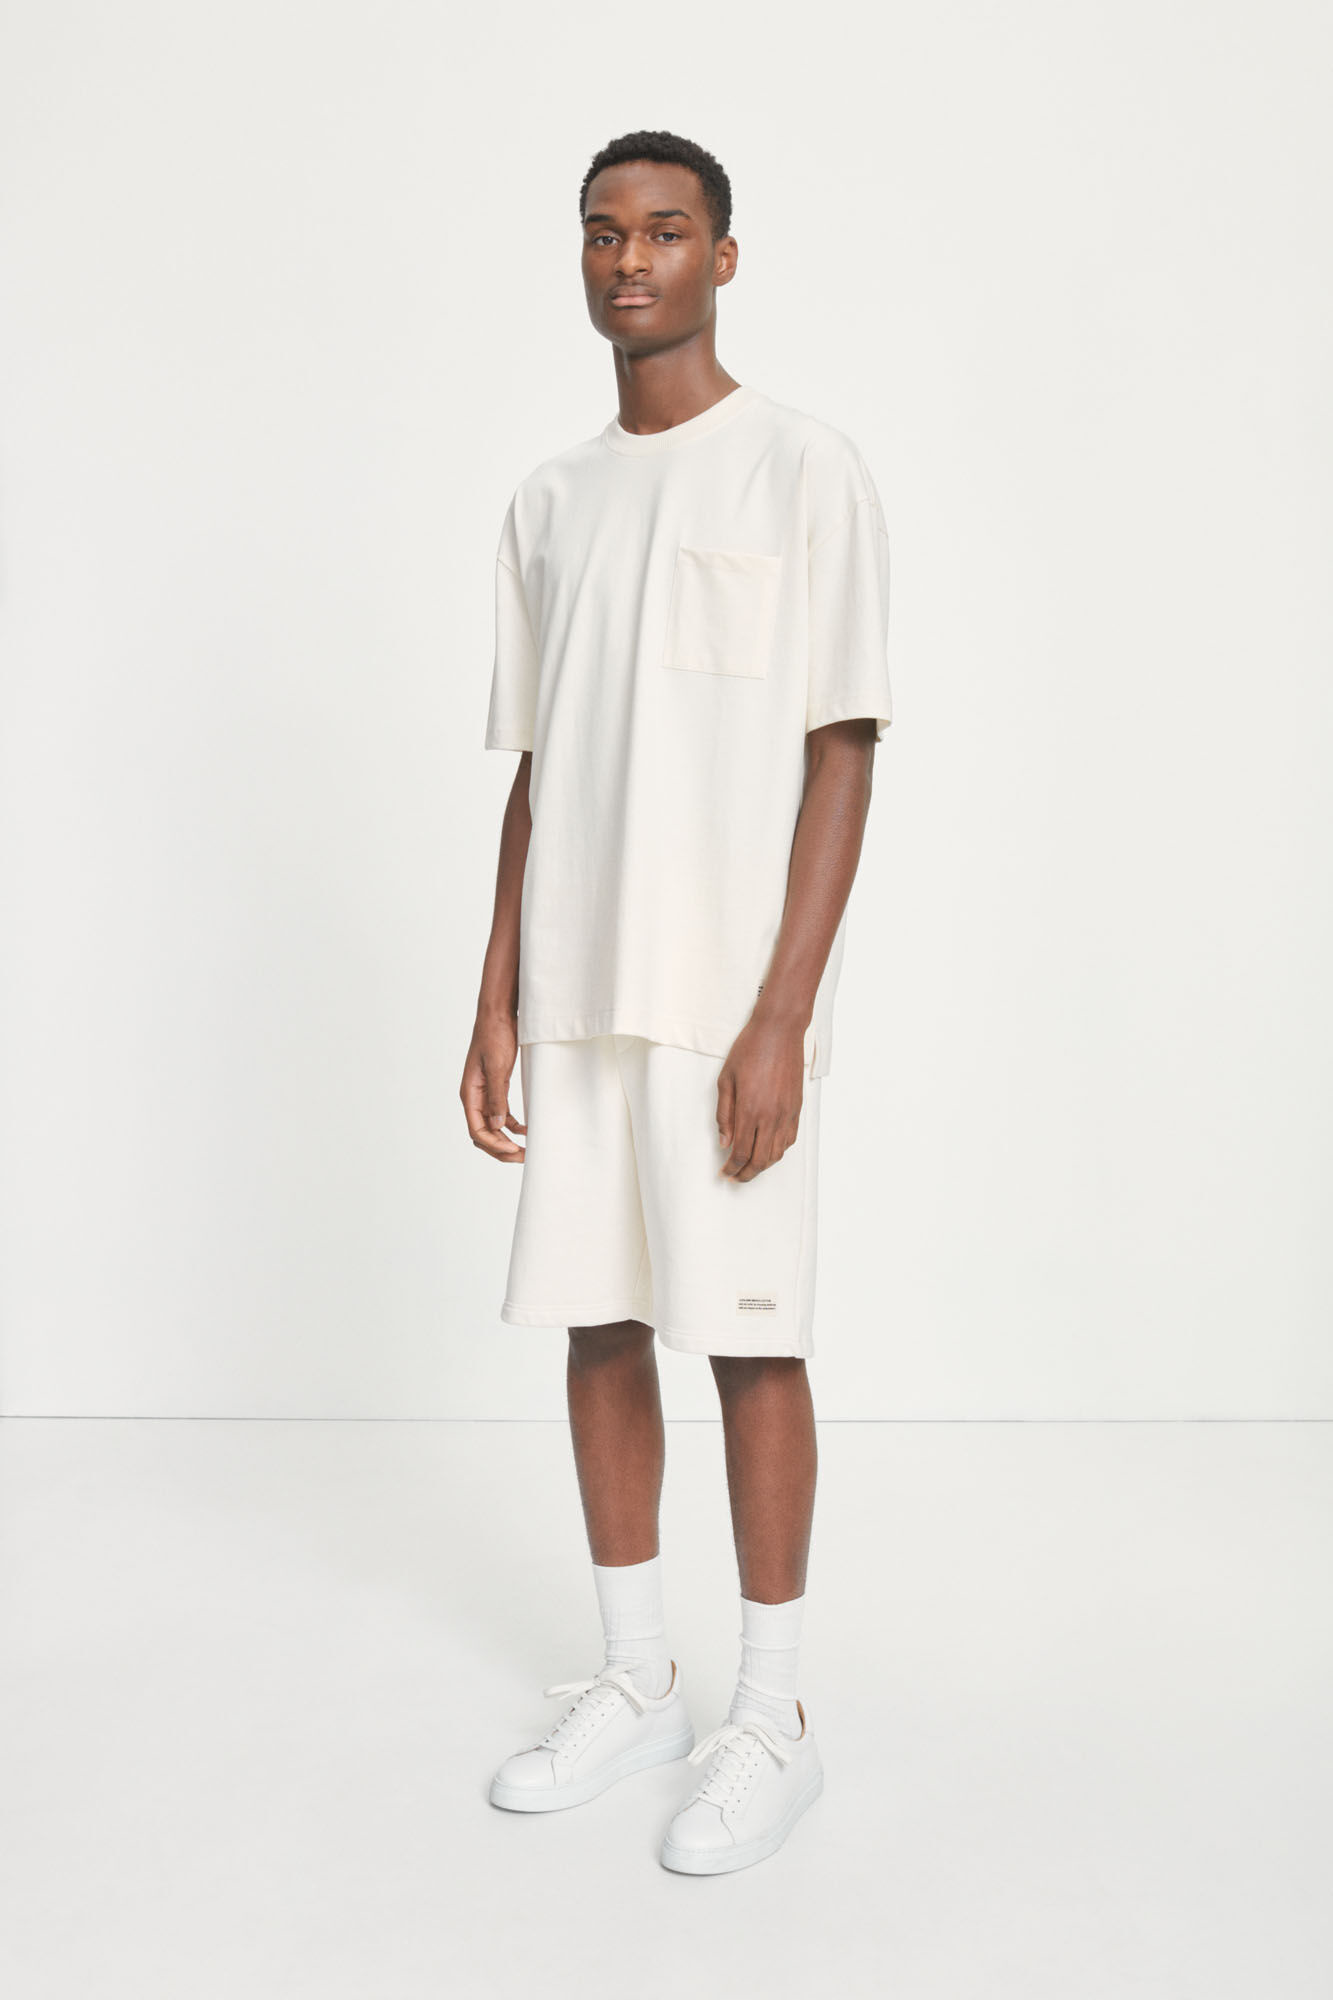 Samsoe Heren Undyed M Oversized T-Shirt Naturel Wit-1